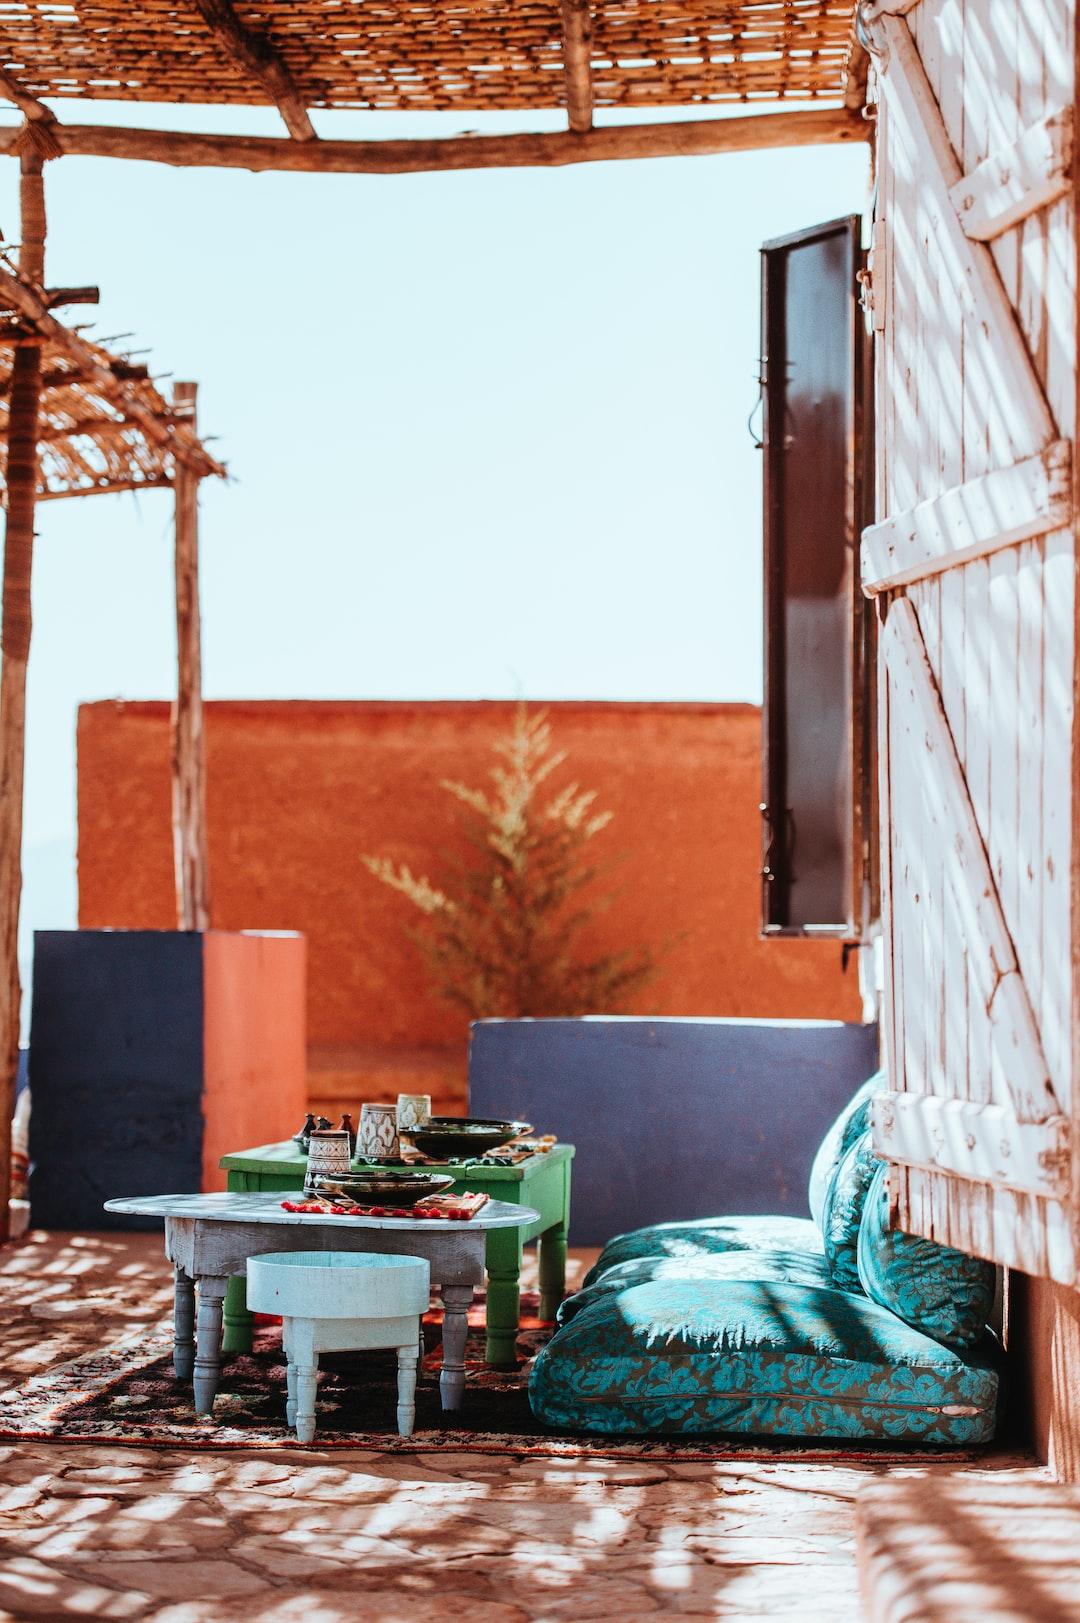 Morocco, Interior, Dining,